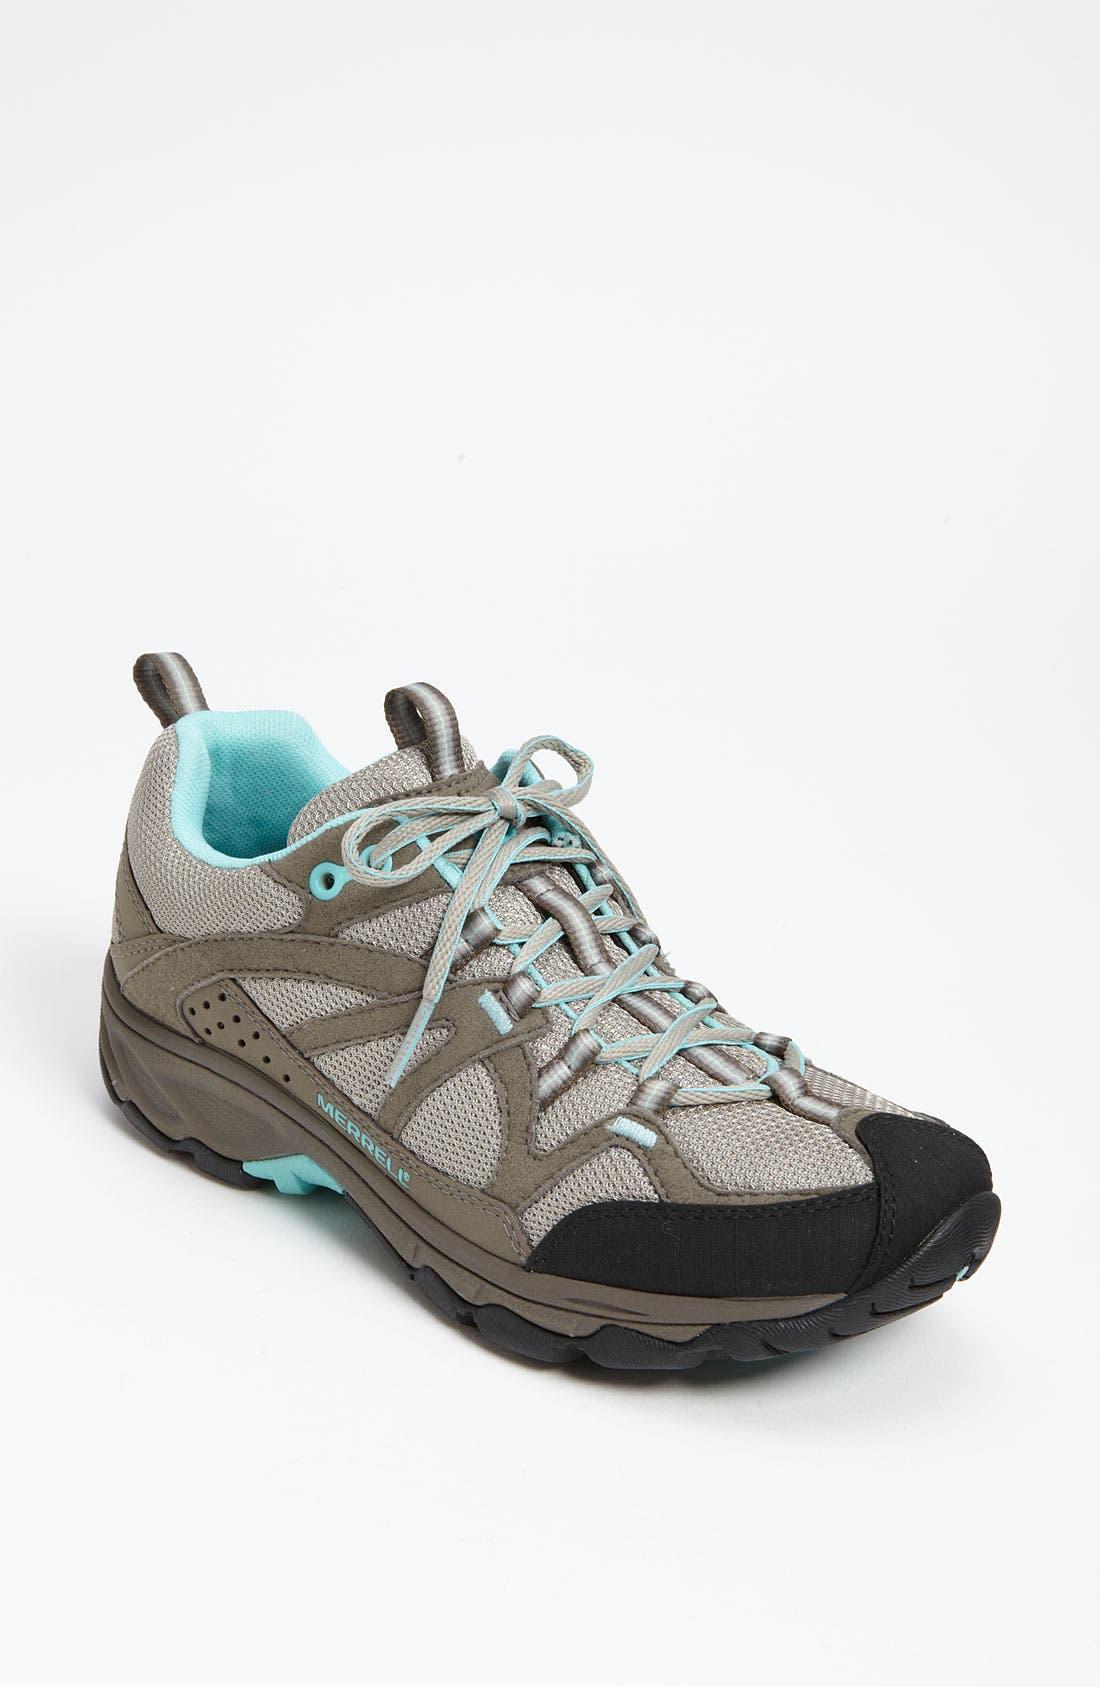 Alternate Image 1 Selected - Merrell 'Calia' Hiking Shoe